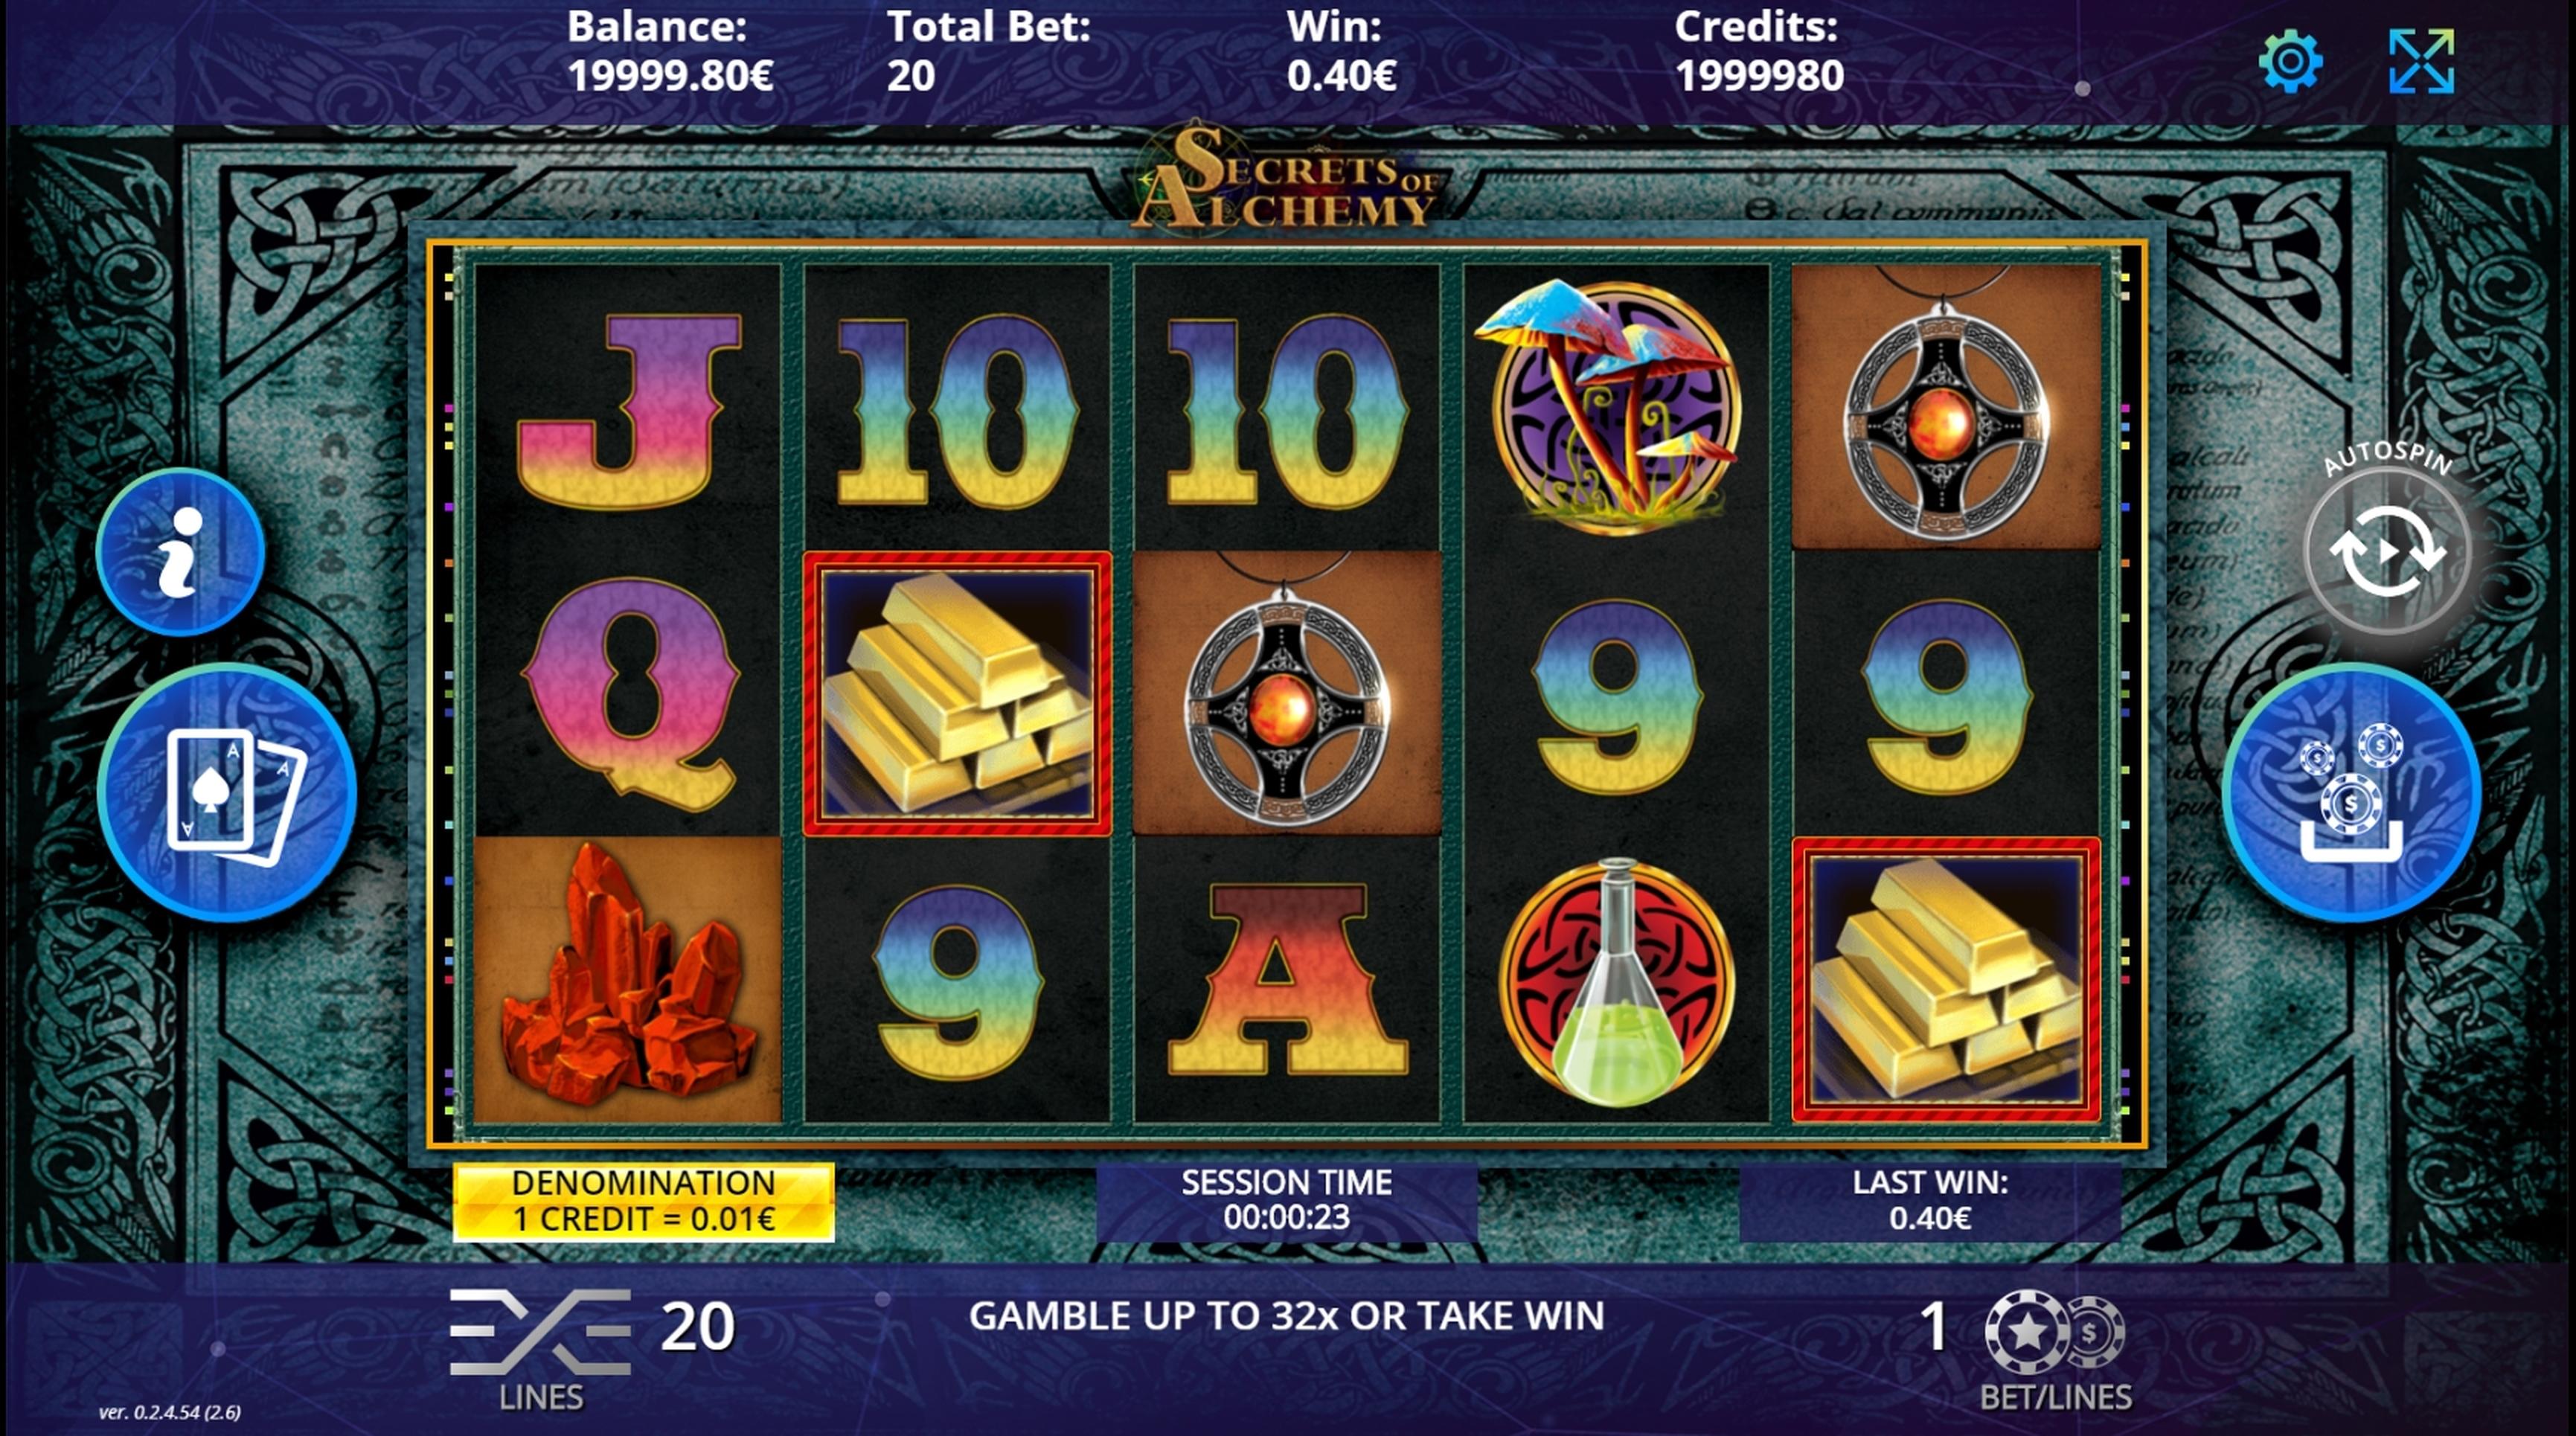 Secrets of Alchemy Slot Machine